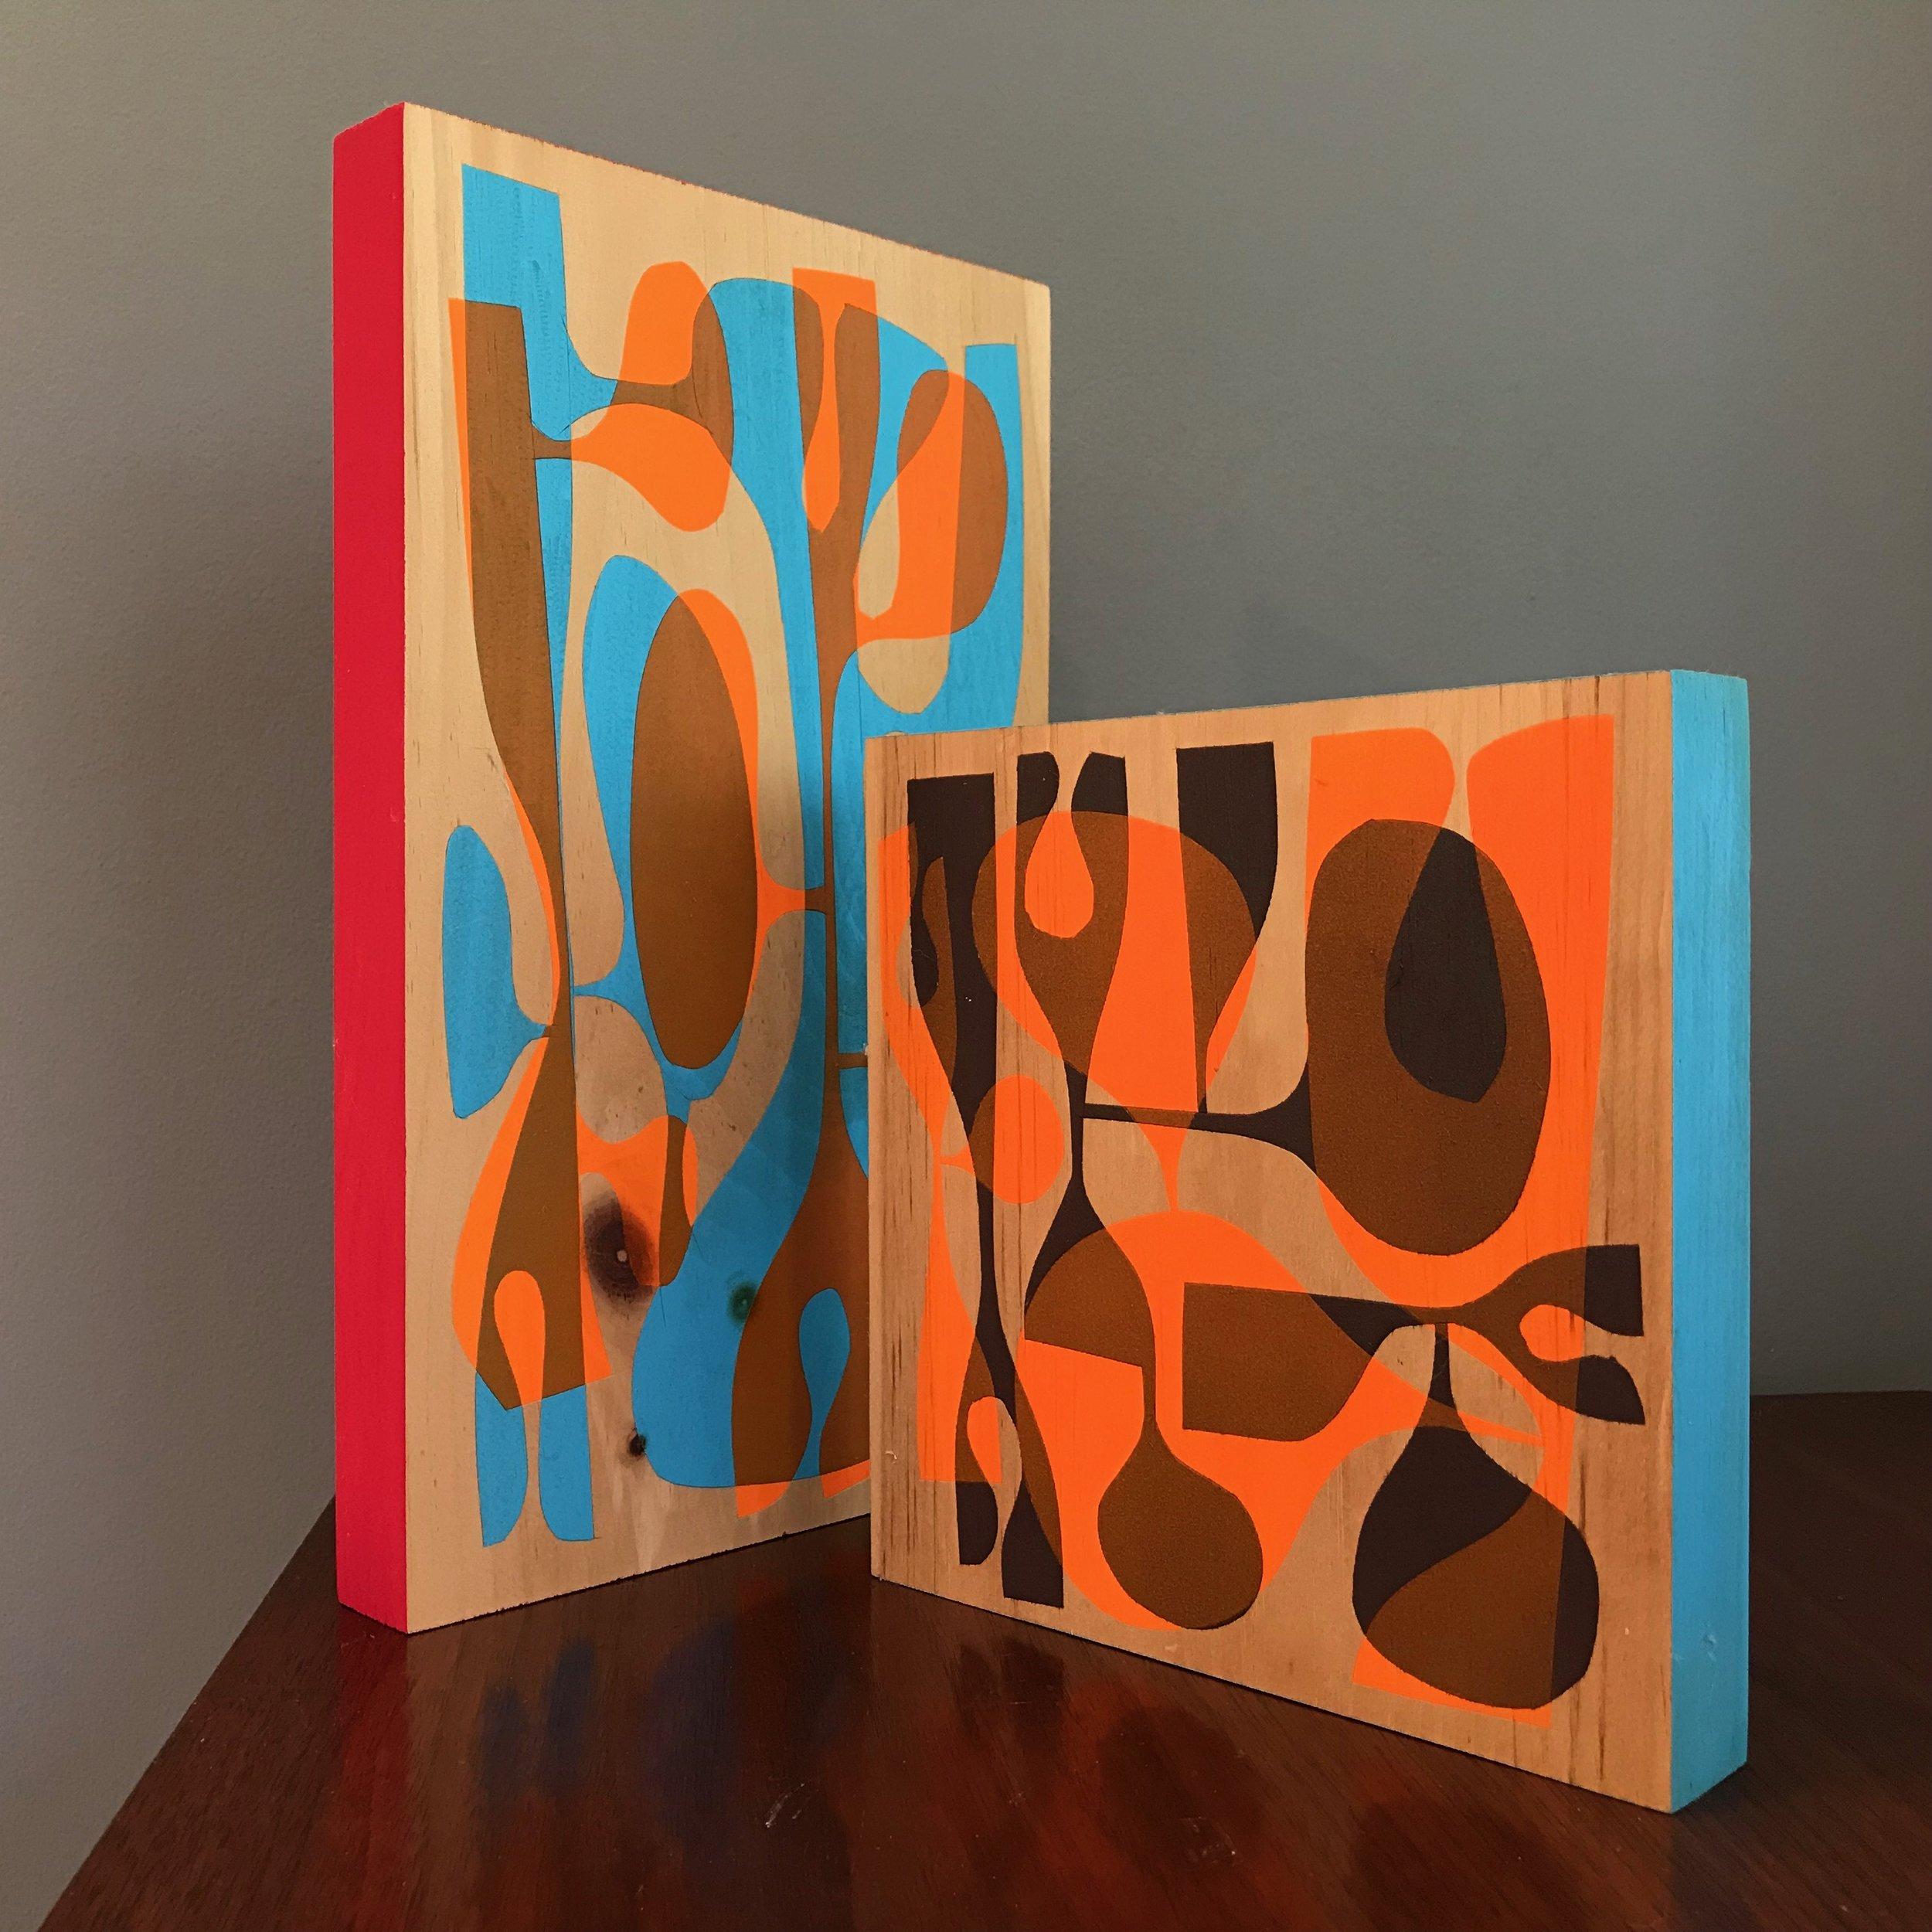 Wishbones + Kidneys: paintings on wood - Abstract paintings on 1